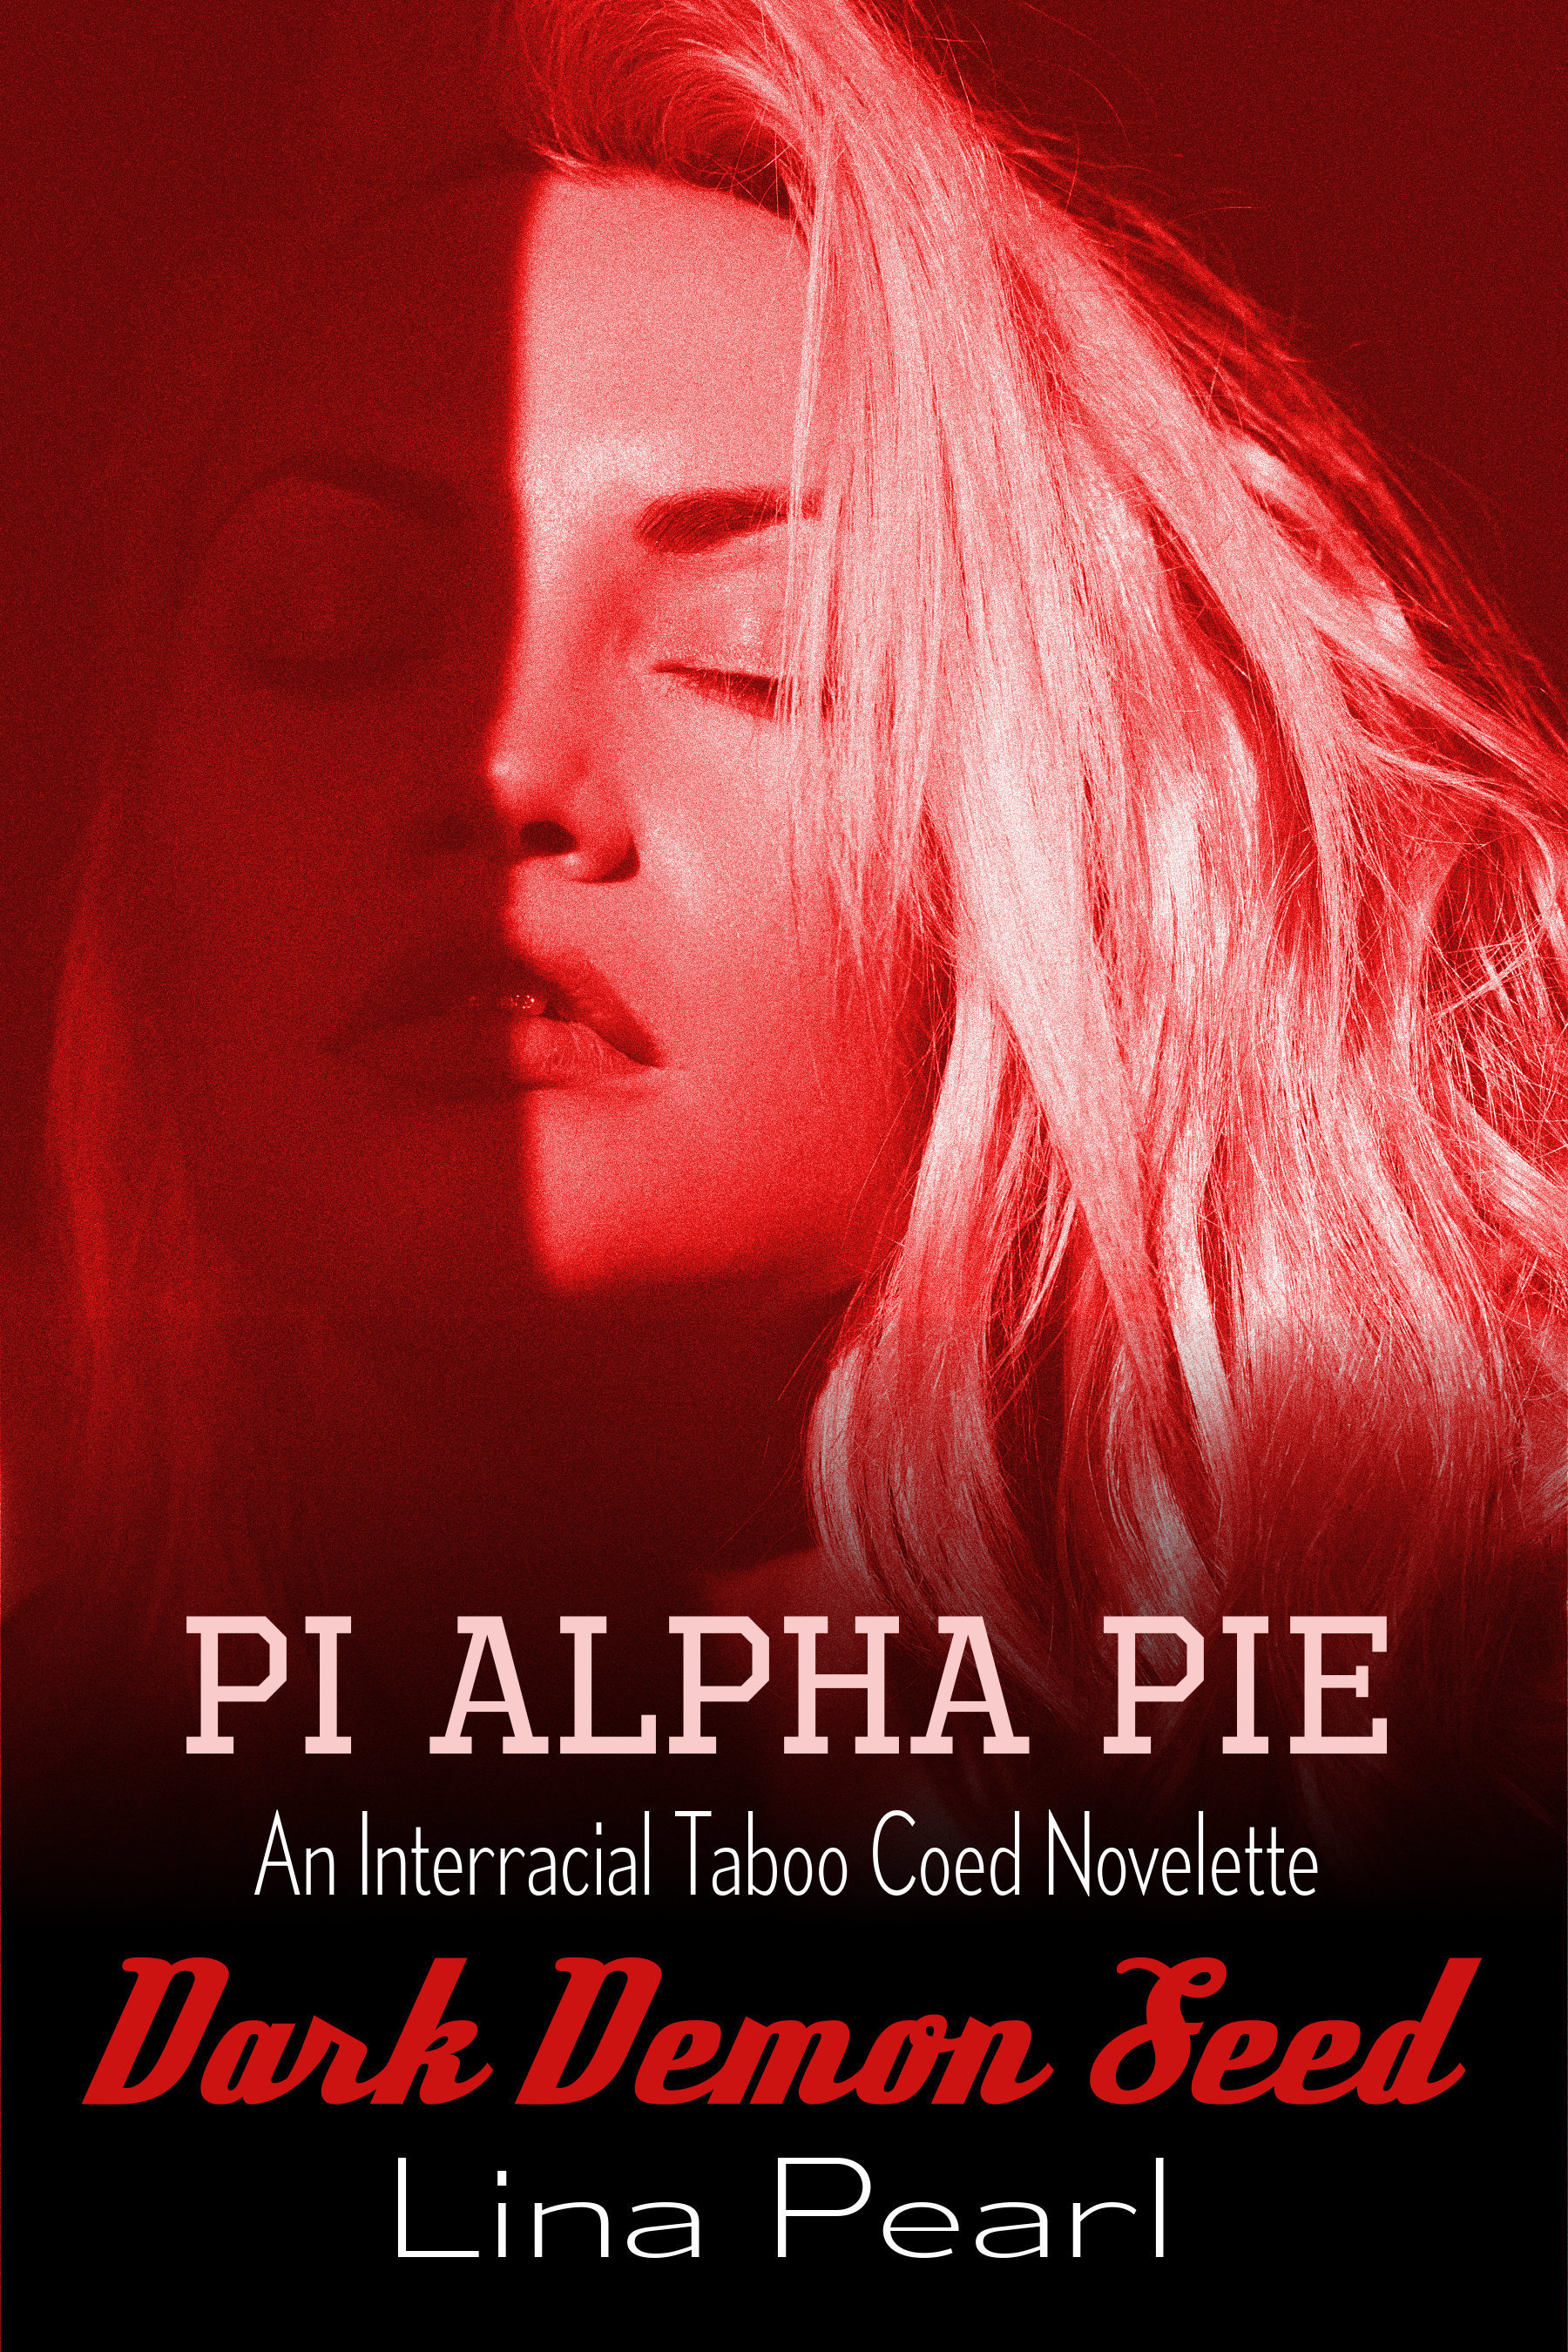 Dark Demon Seed: An Interracial Taboo Coed Novelette (Pi Alpha Pie #3)  by  Lina Pearl